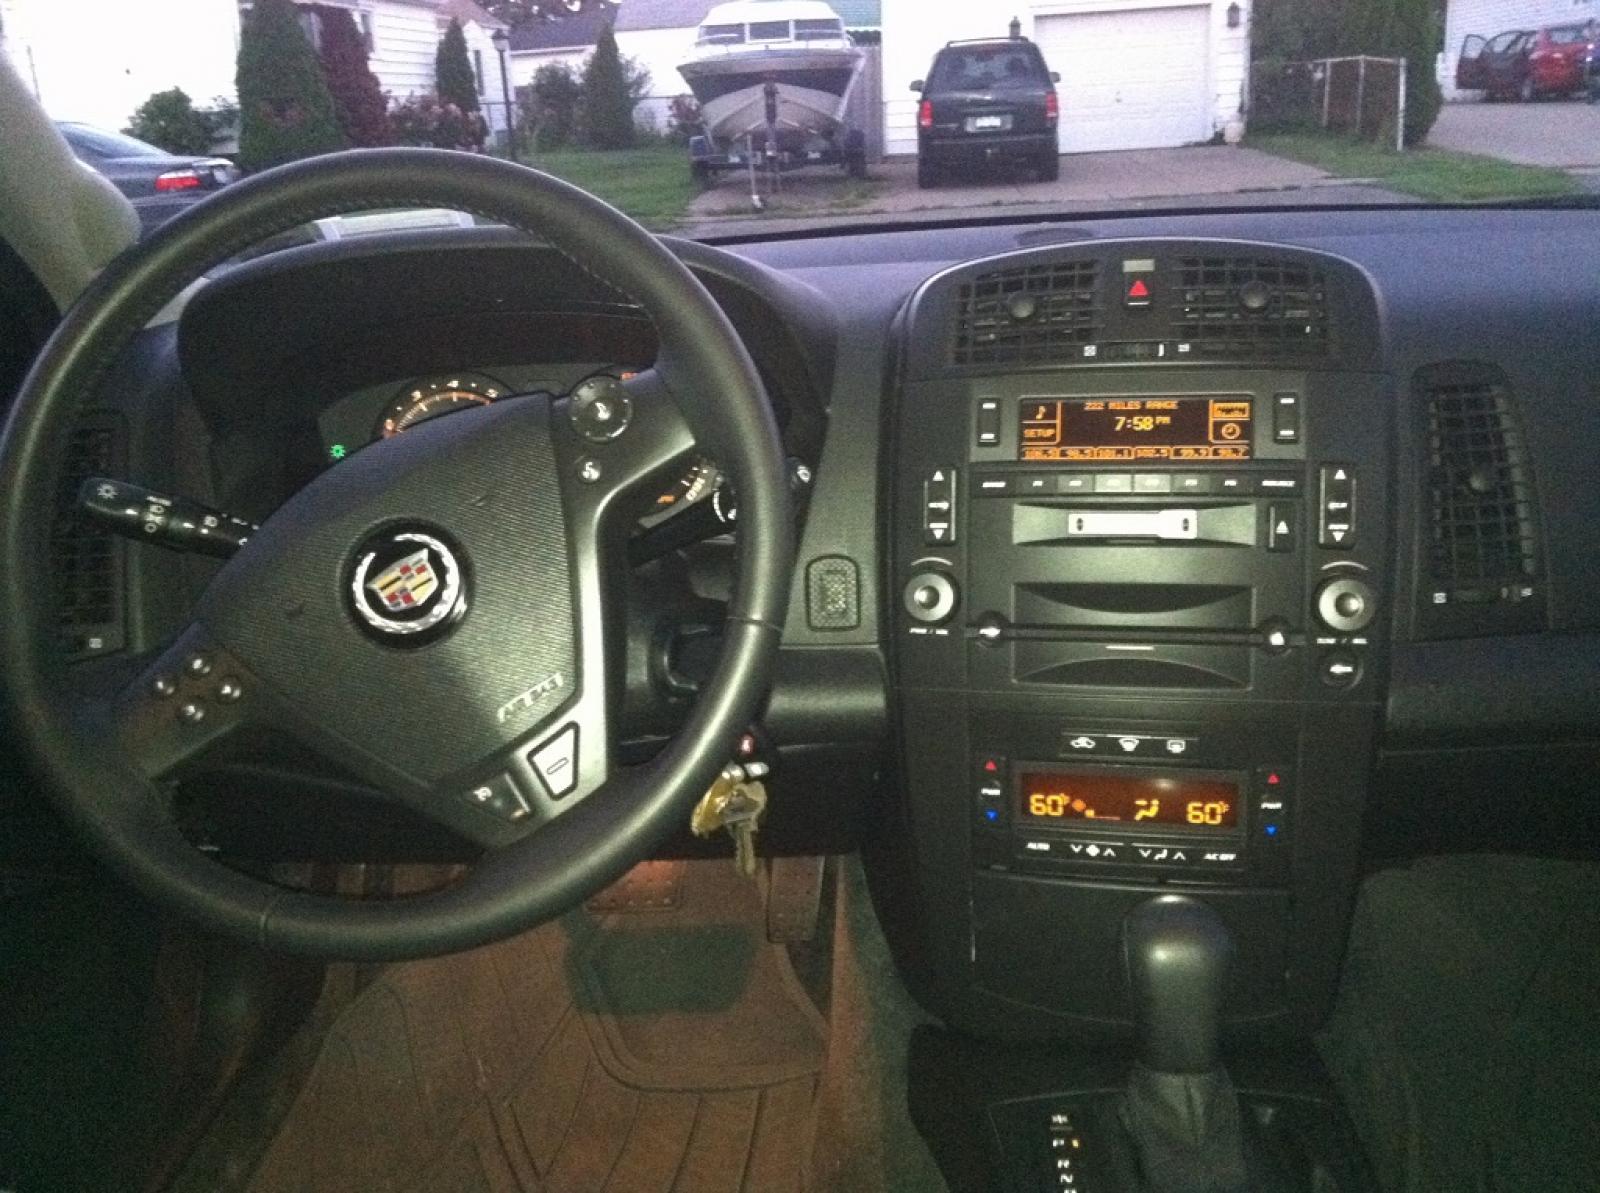 800 1024 1280 1600 Origin 2003 Cadillac Cts